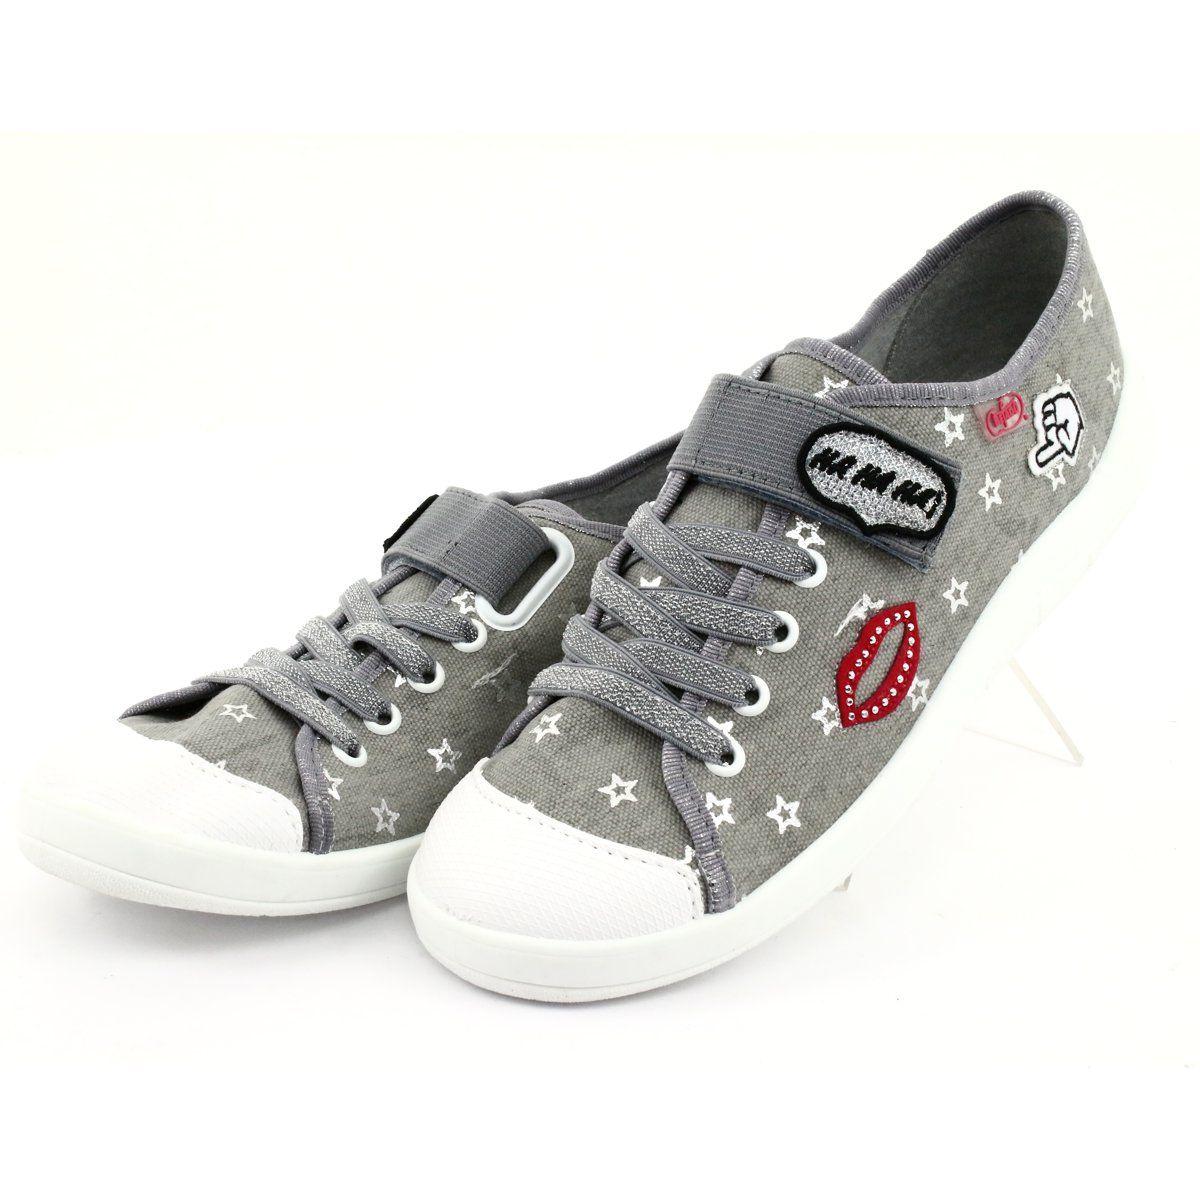 Befado Obuwie Dzieciece 251q095 Szare Kid Shoes Childrens Shoes Childrens Slippers